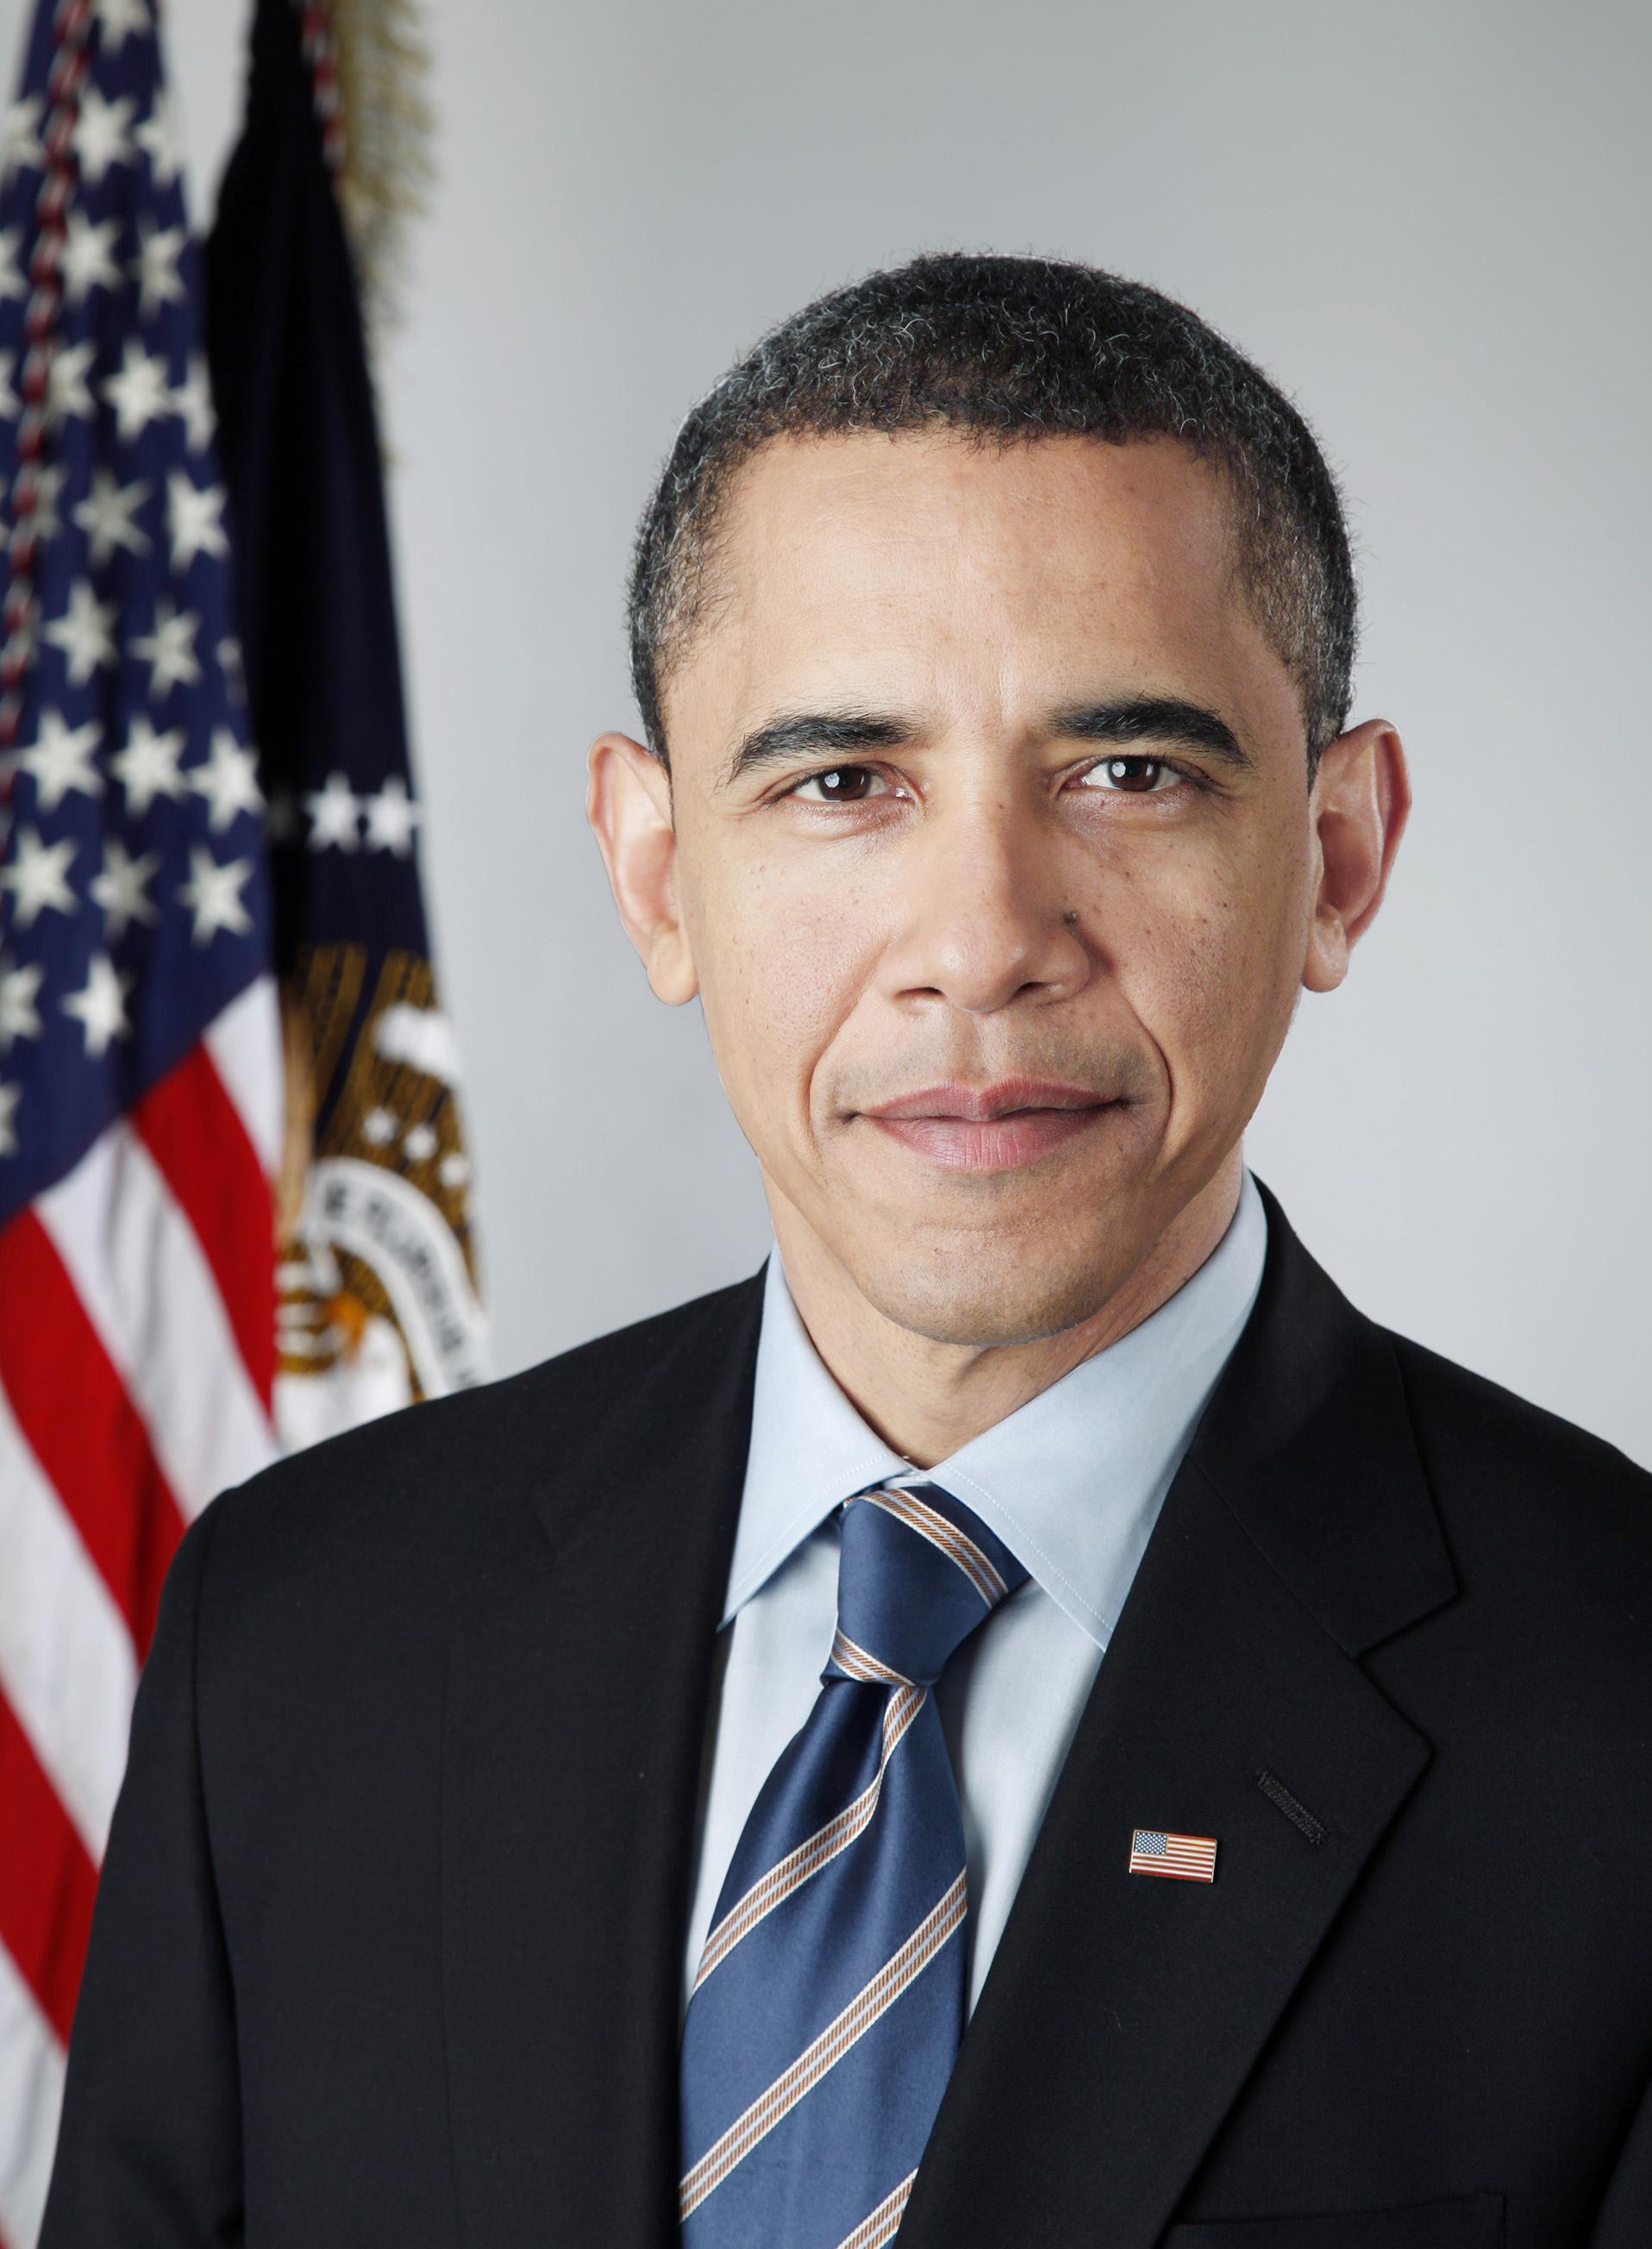 Obama 290 - Copy (2) - Copy.jpg